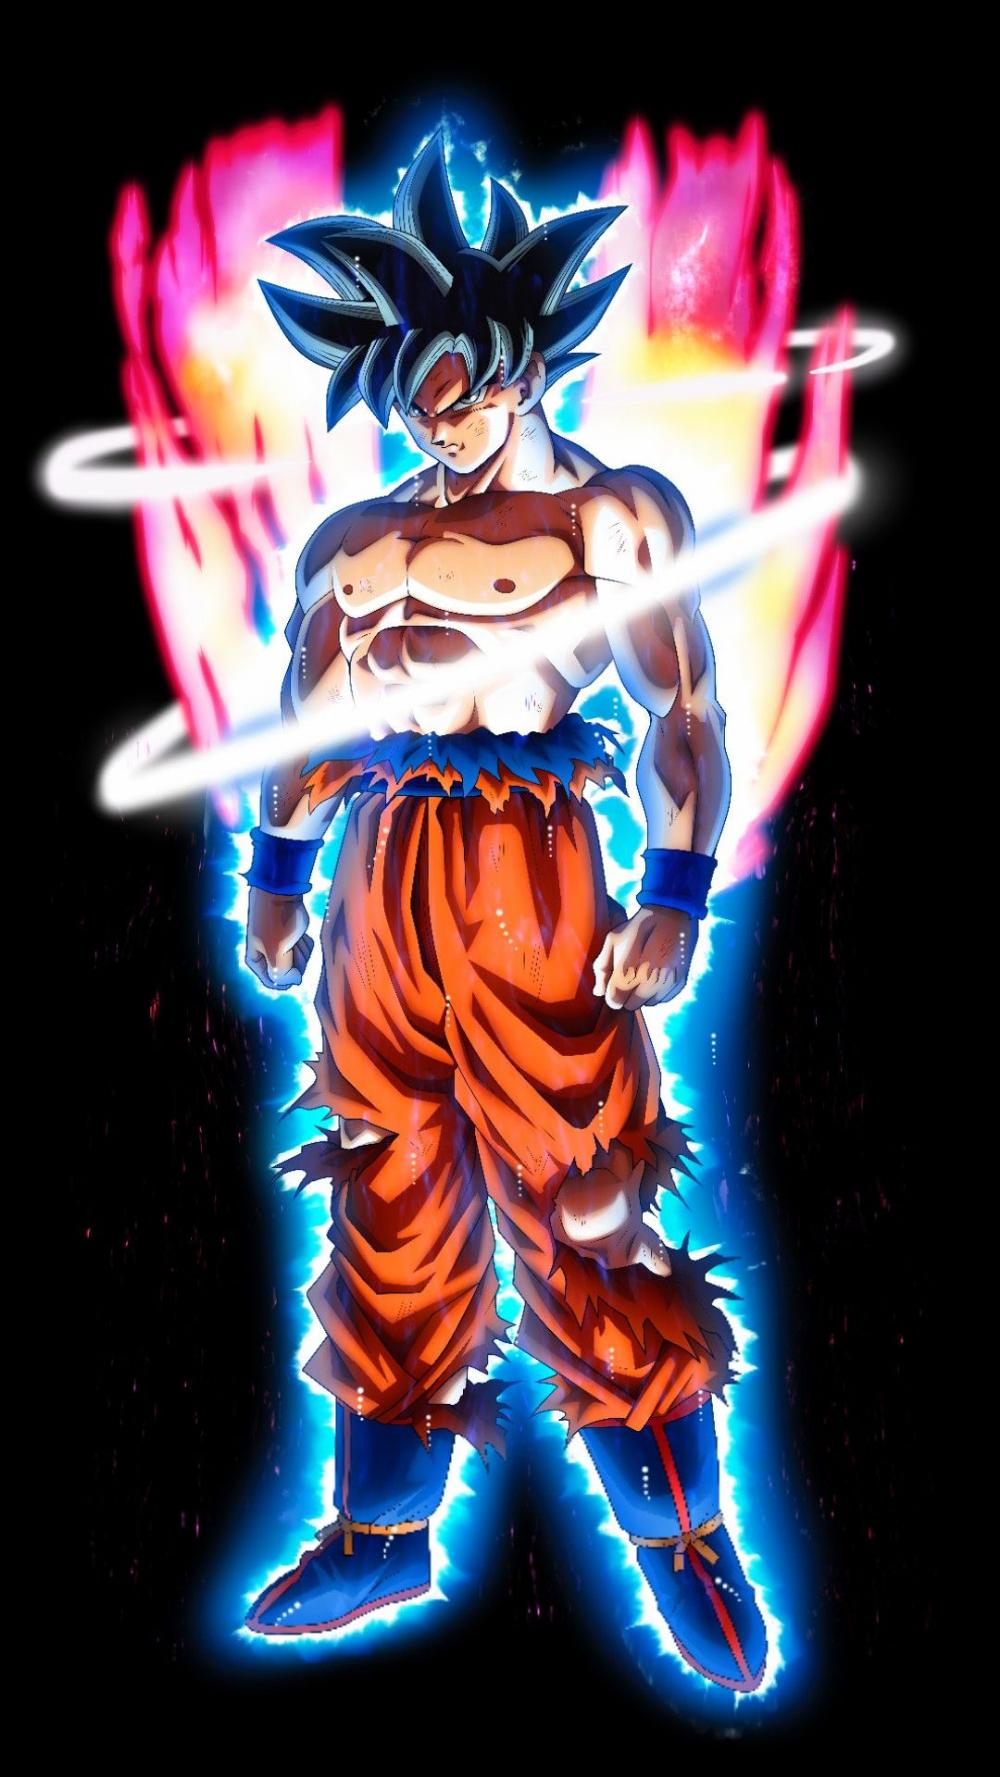 Goku Full Body Google Search Anime Dragon Ball Super Dragon Ball Super Goku Dragon Ball Super Manga